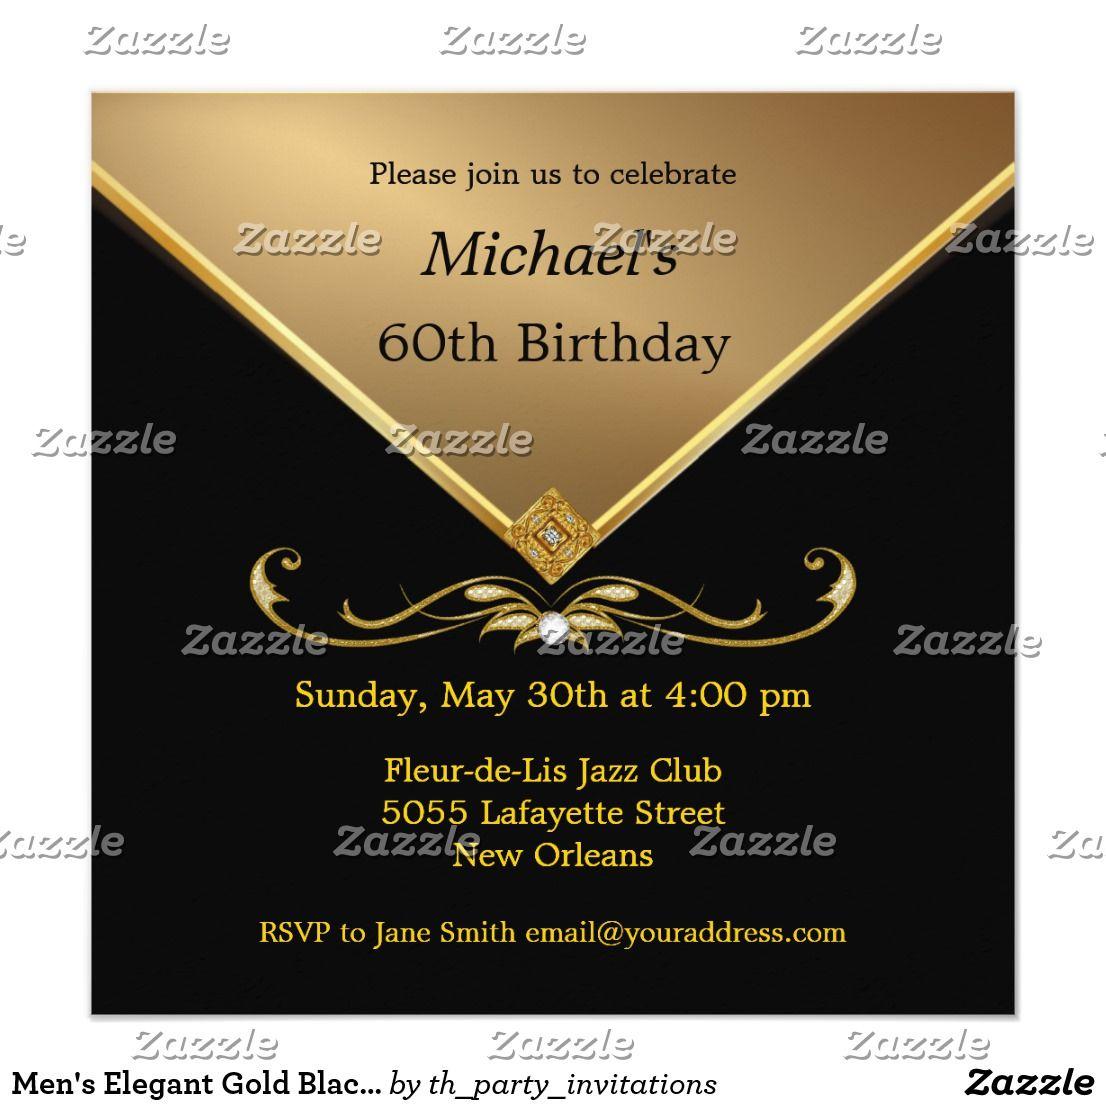 Men's Elegant Gold Black 60th Brithday Invitations   Zazzle.com   Blue birthday  parties, Black gold party, Birthday party invitations